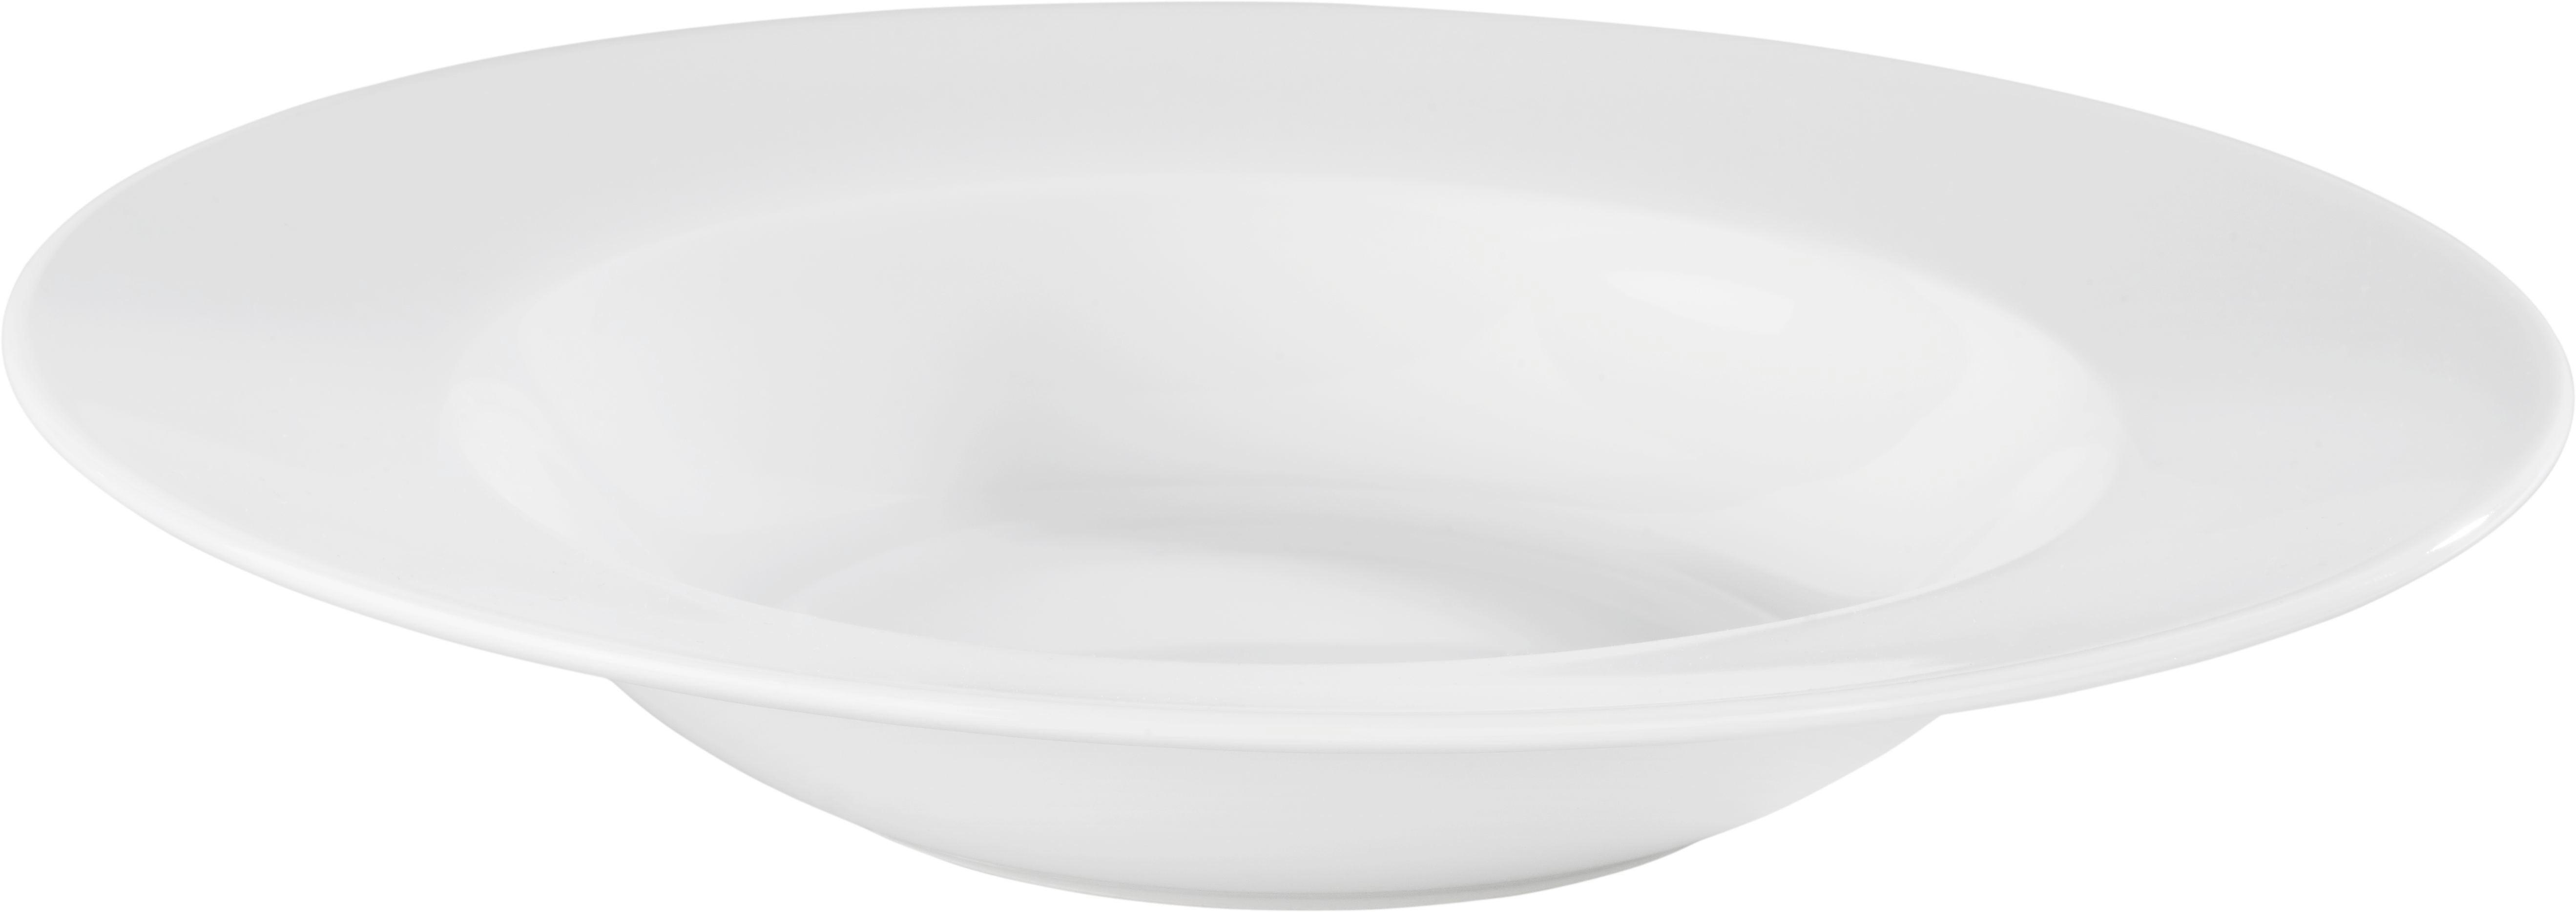 Globoki Krožnik Adria - bela, Konvencionalno, keramika (21,5cm) - MÖMAX modern living